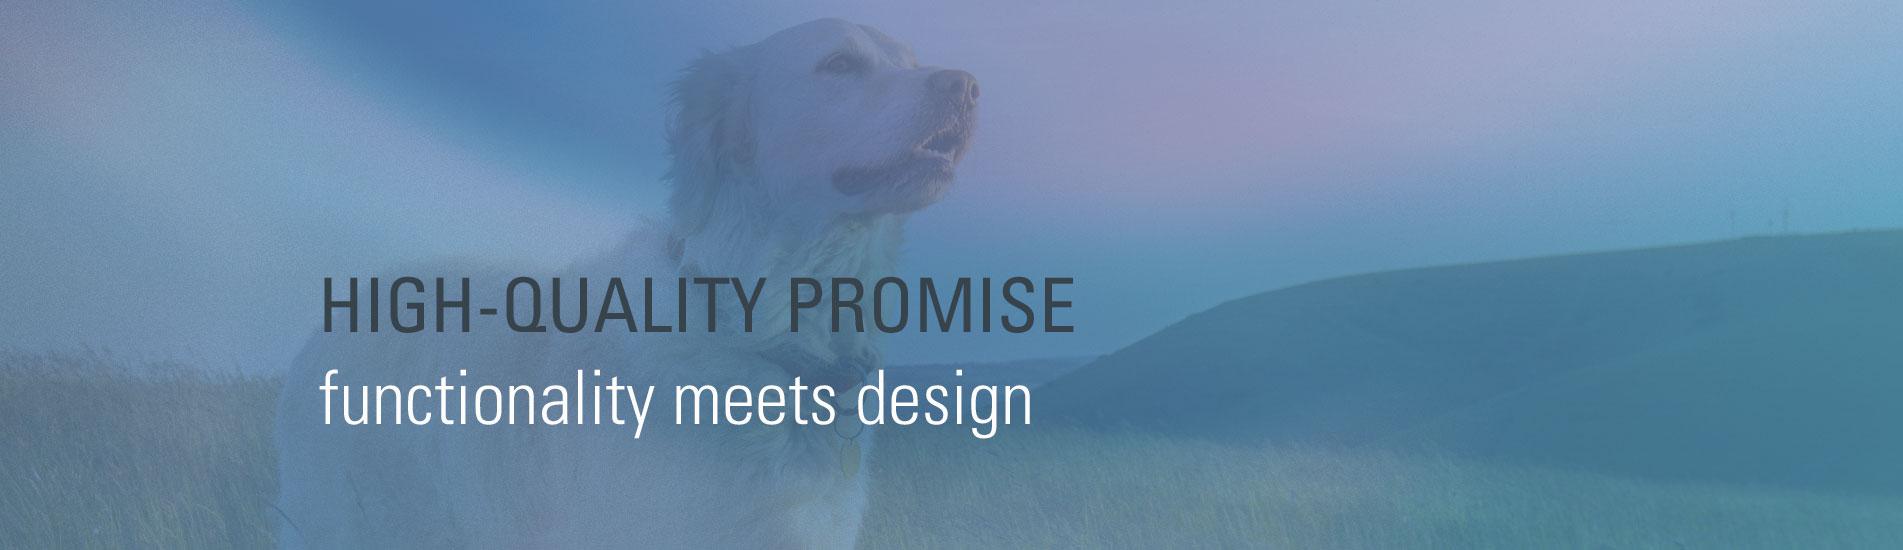 tiwegu high-quality promise